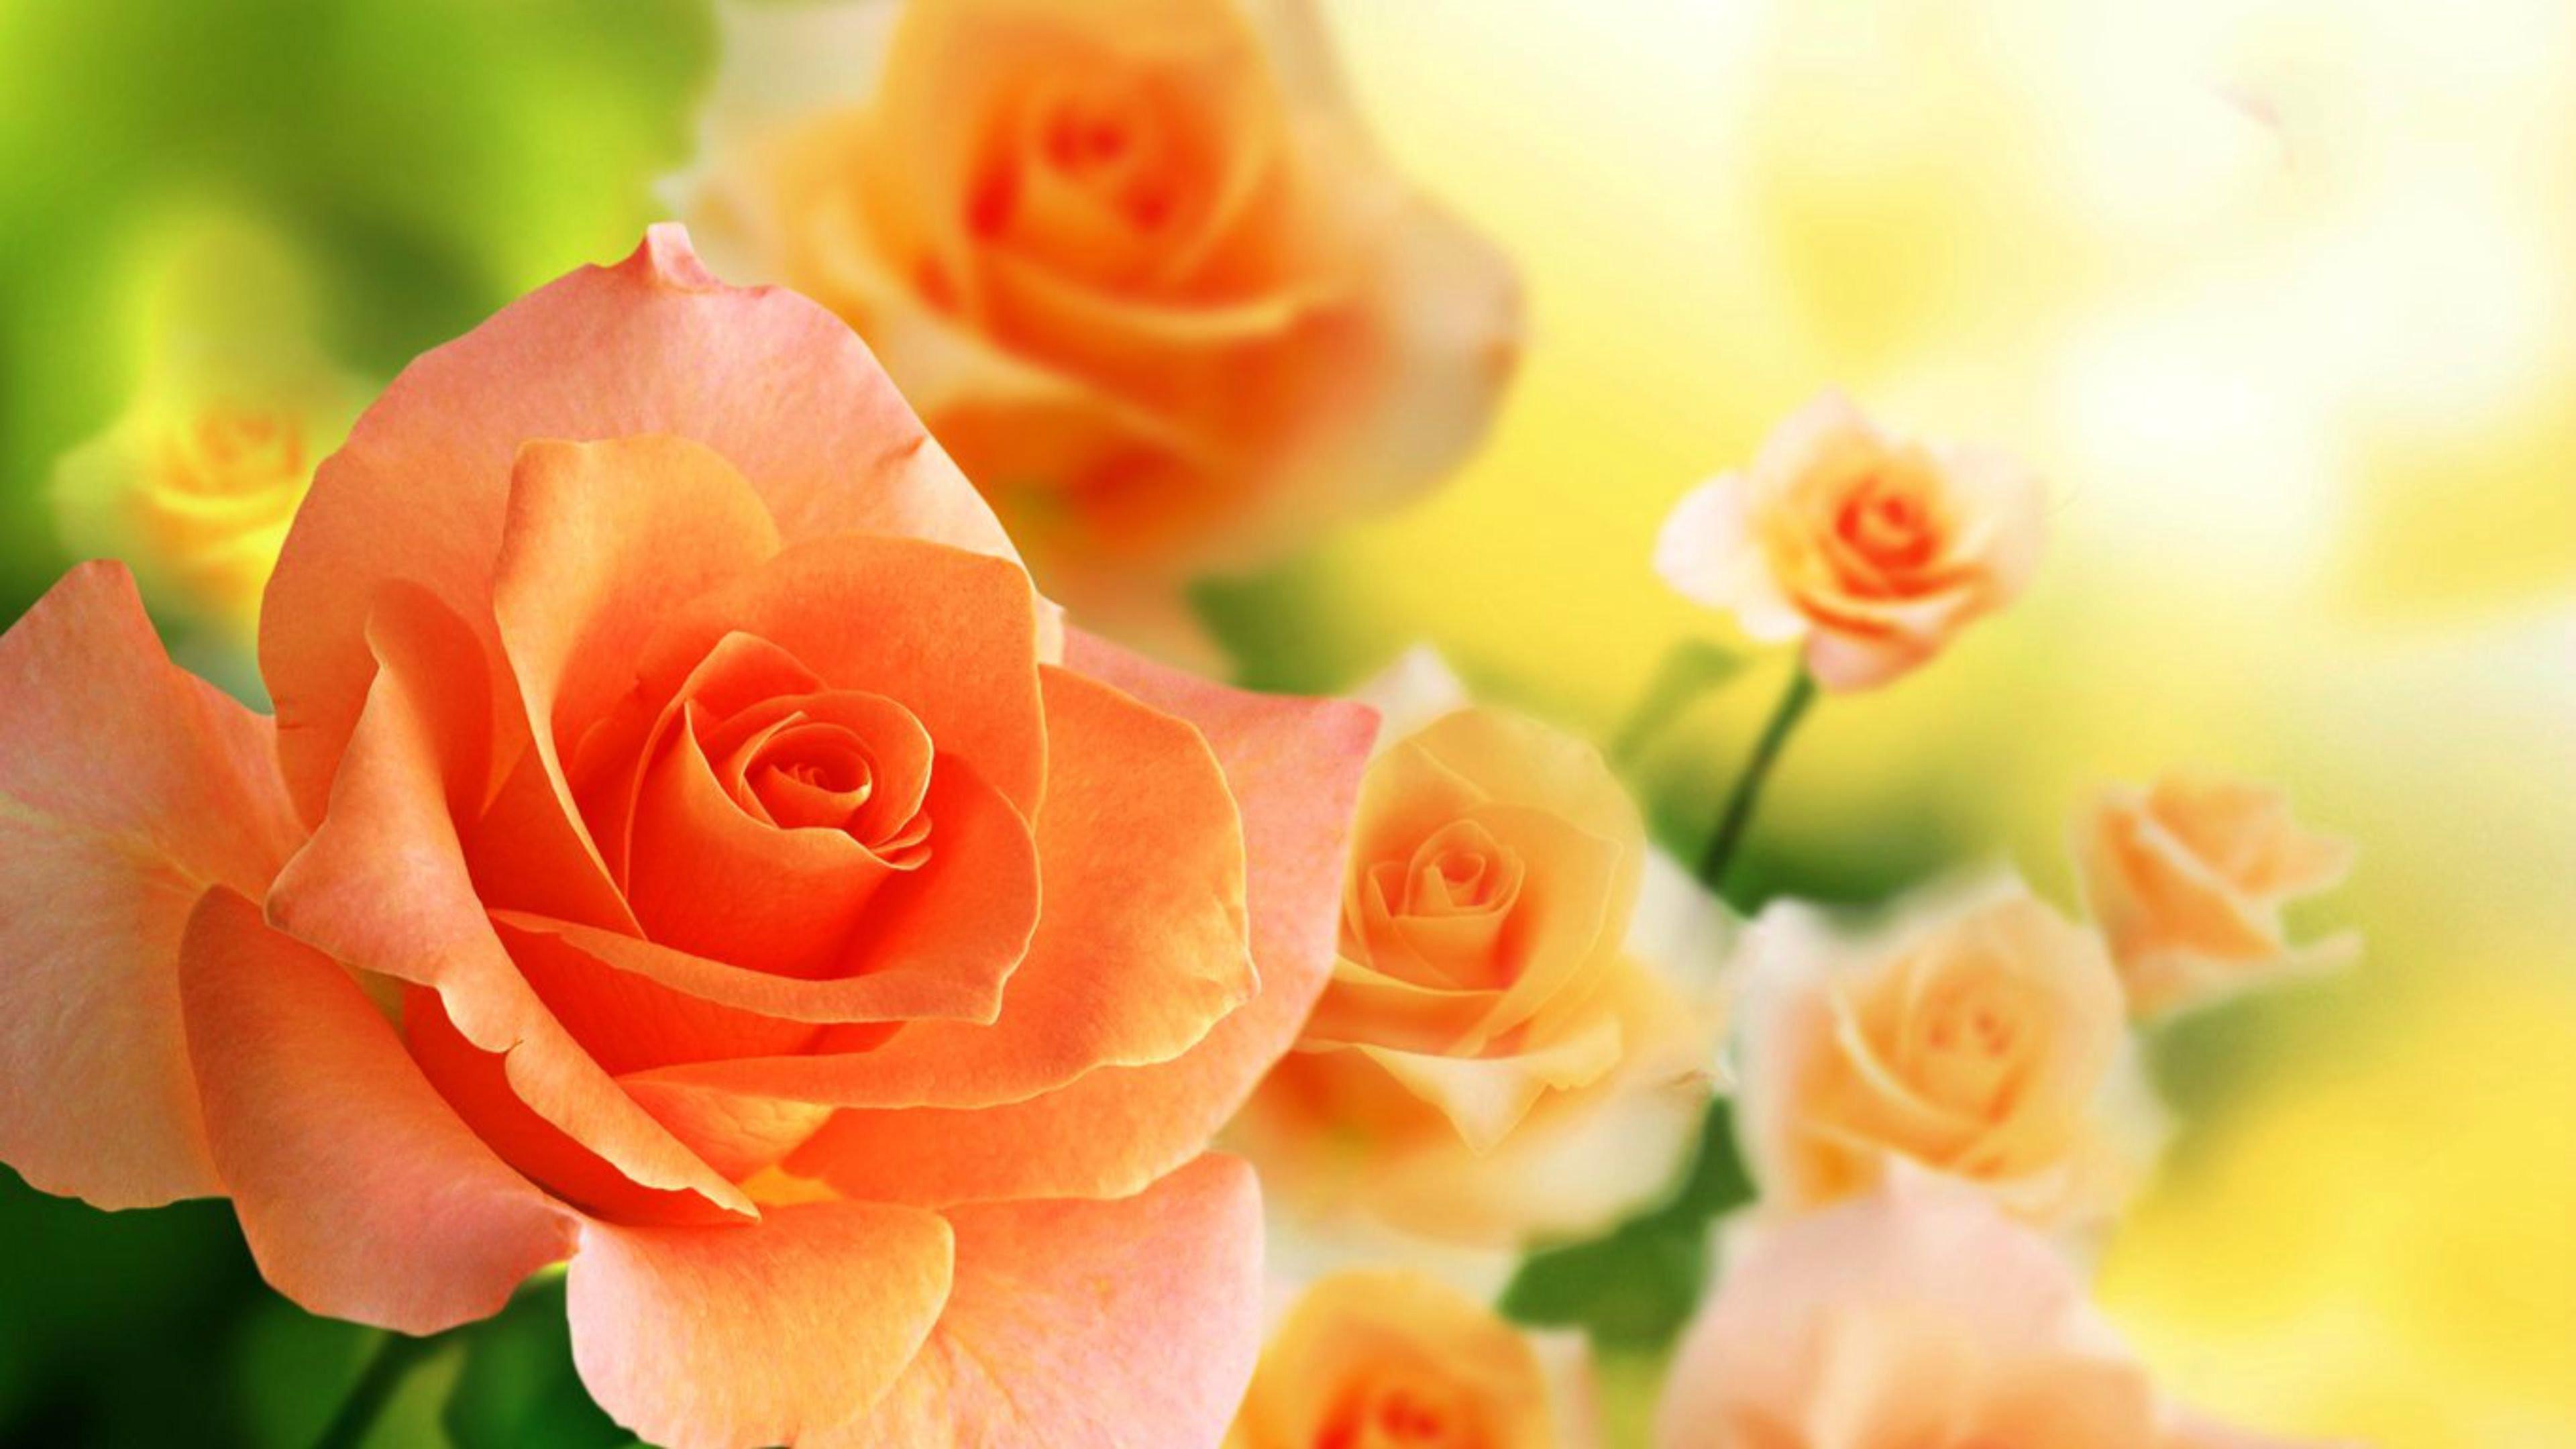 Beautiful Rose Wallpaper Download Rose Wallpaper Download - Beautiful Orange Rose Flowers , HD Wallpaper & Backgrounds